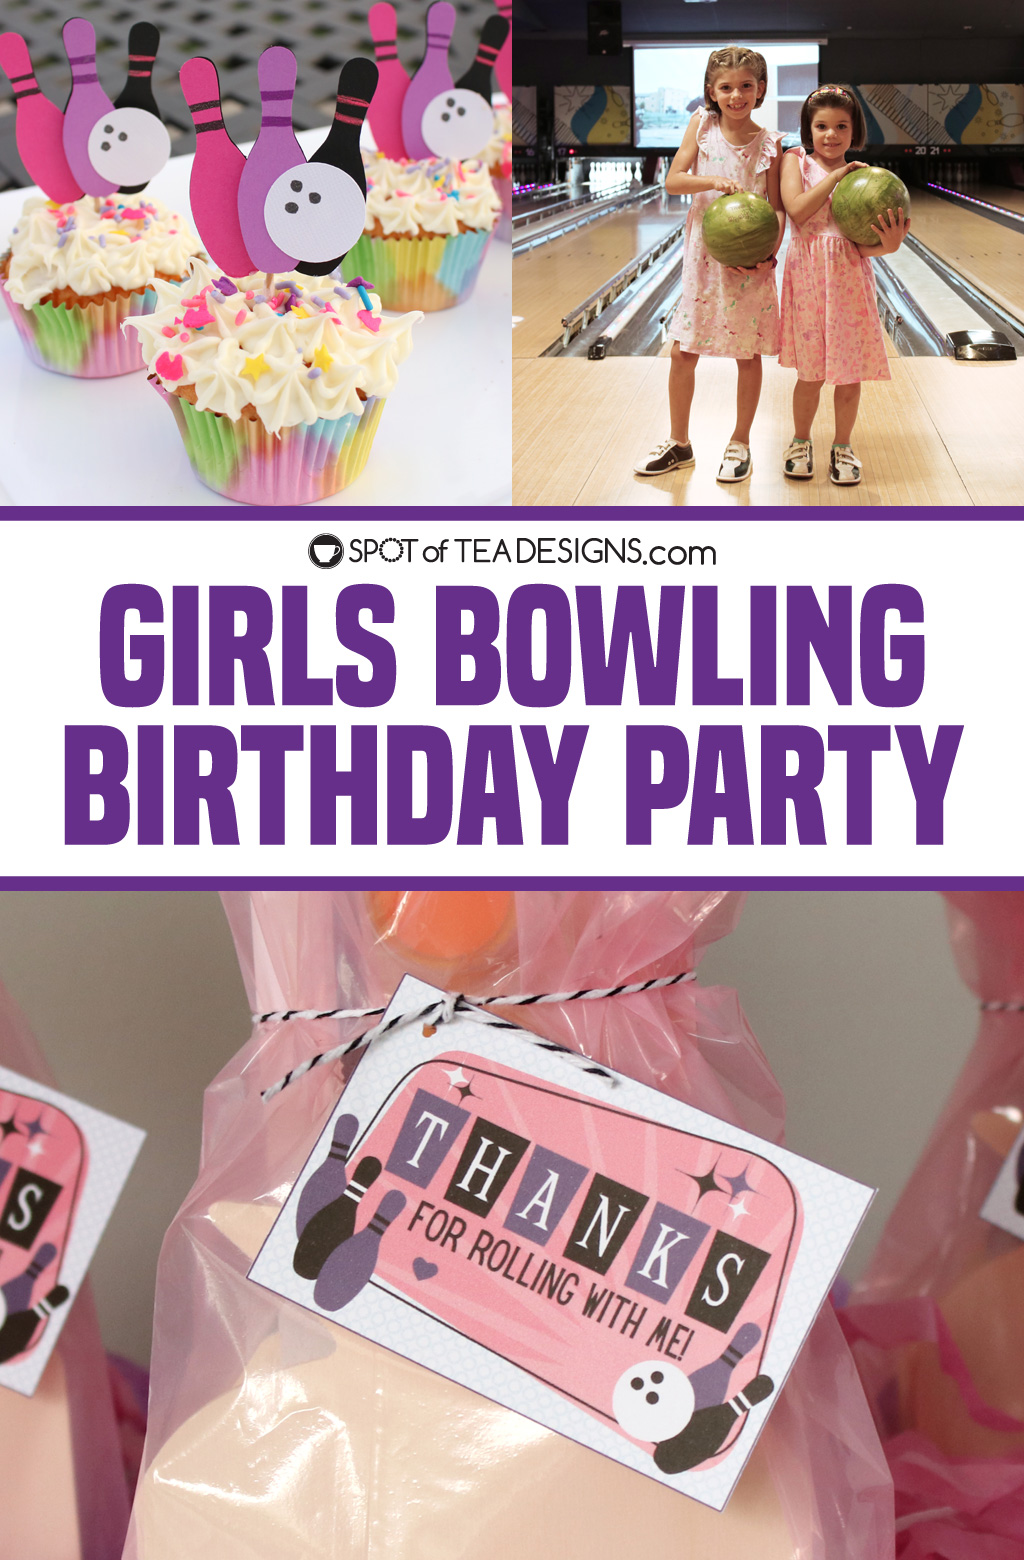 girls bowling birthday party recap | spotofteadesigns.com